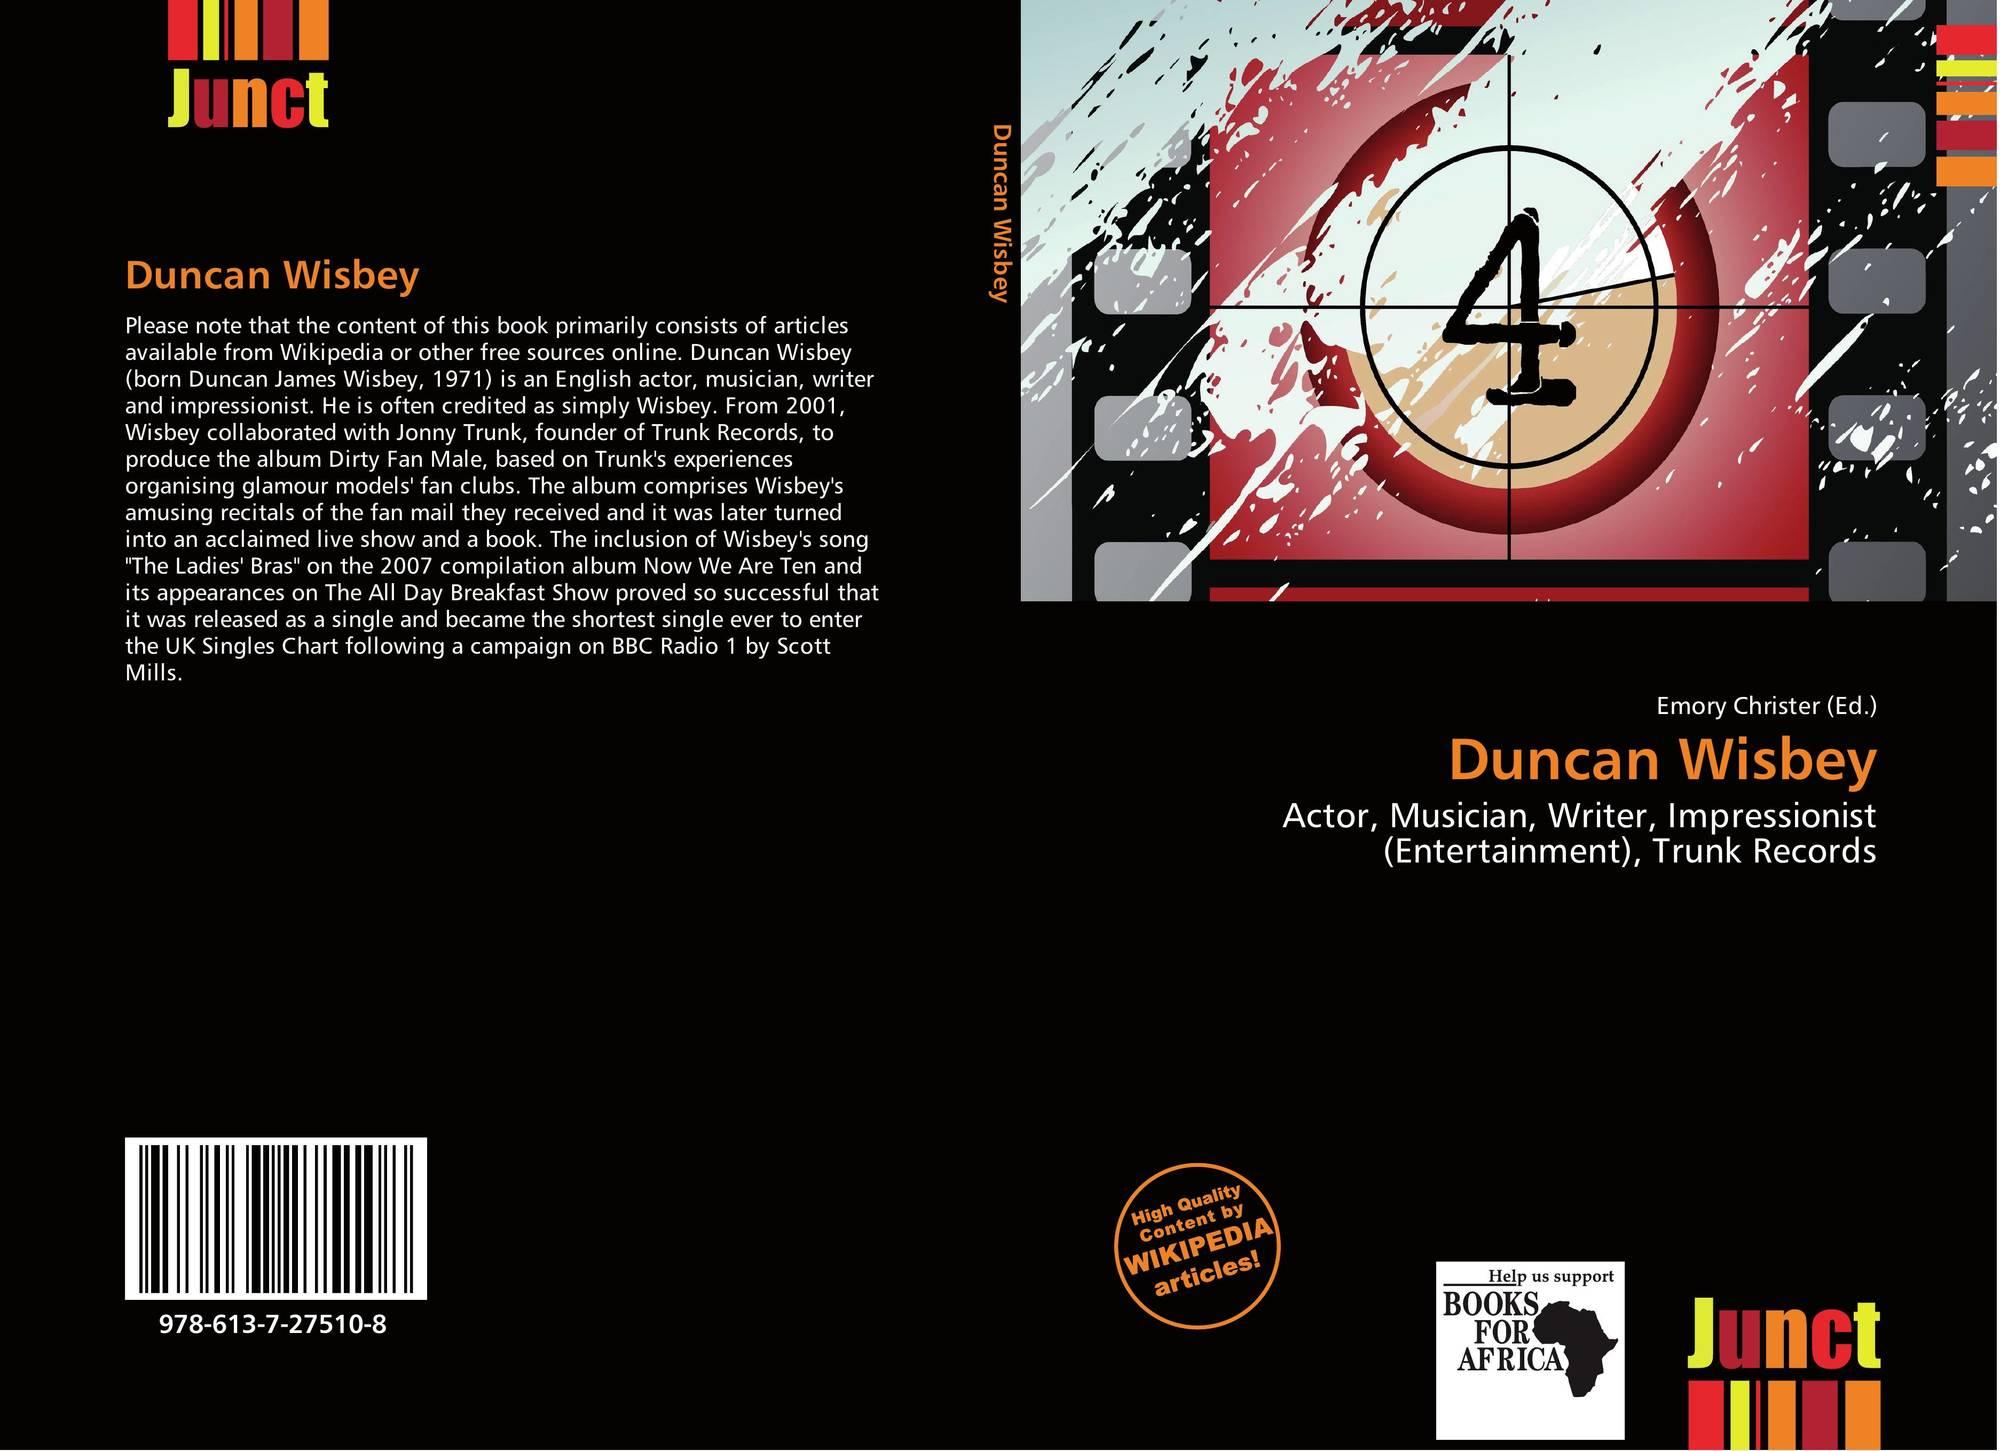 Duncan Wisbey (born 1971)